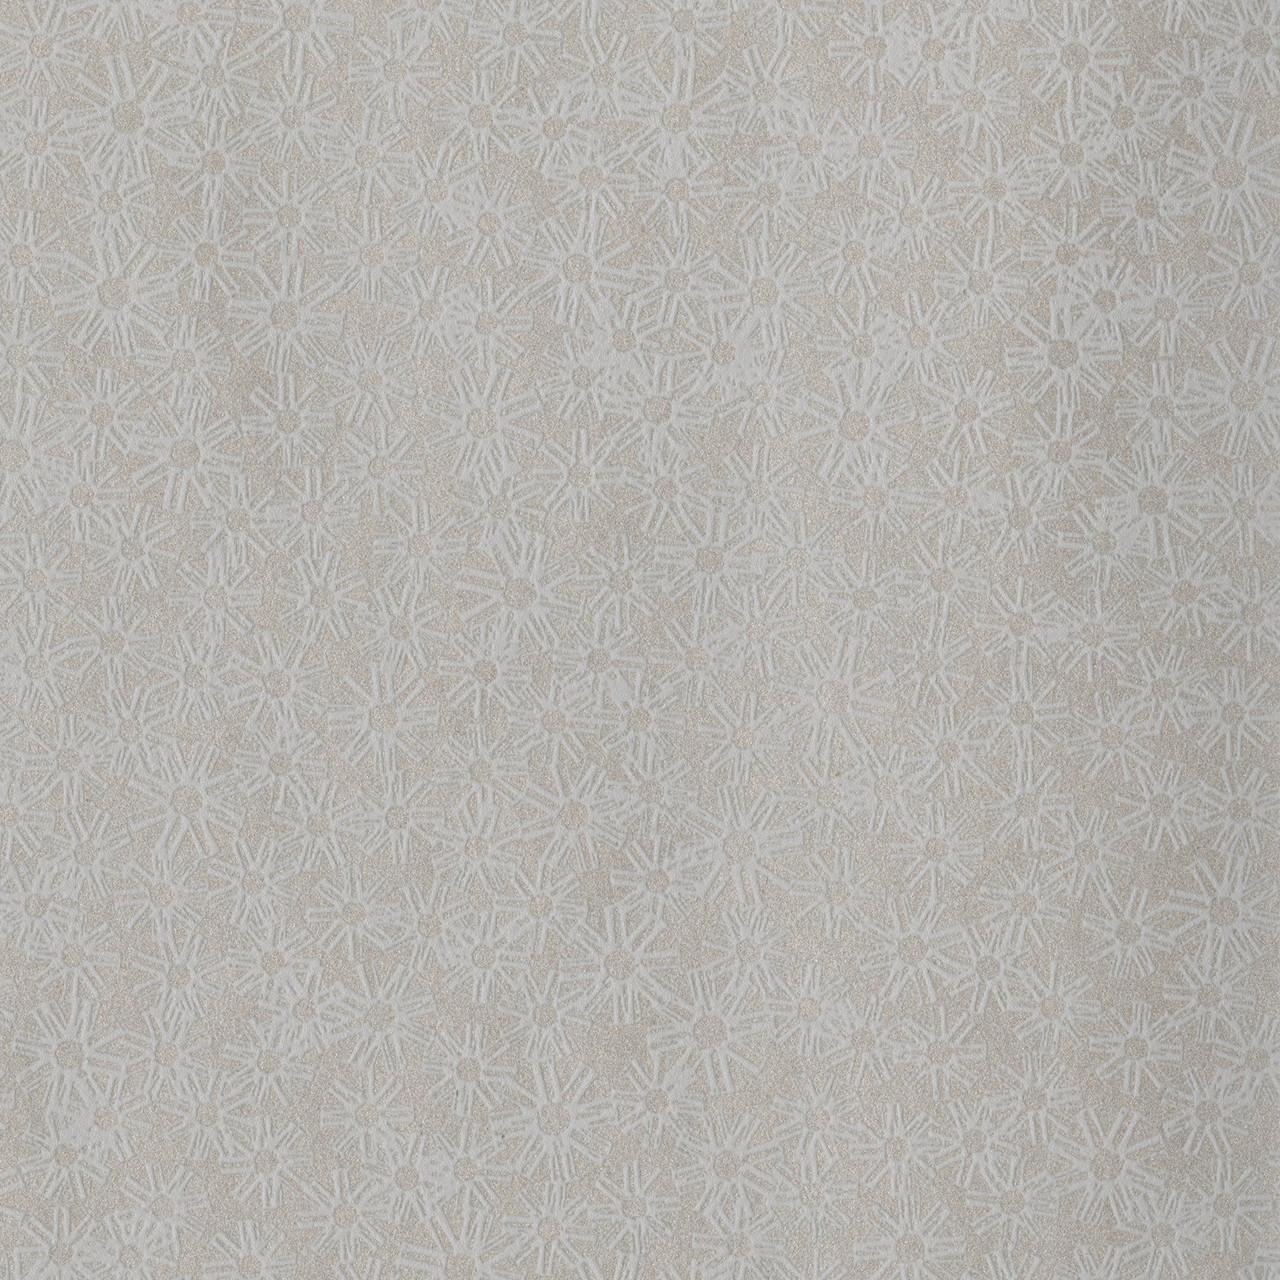 Janie Brown Metallic Floral 352066 Wallpaper Indoorwallpaper Com